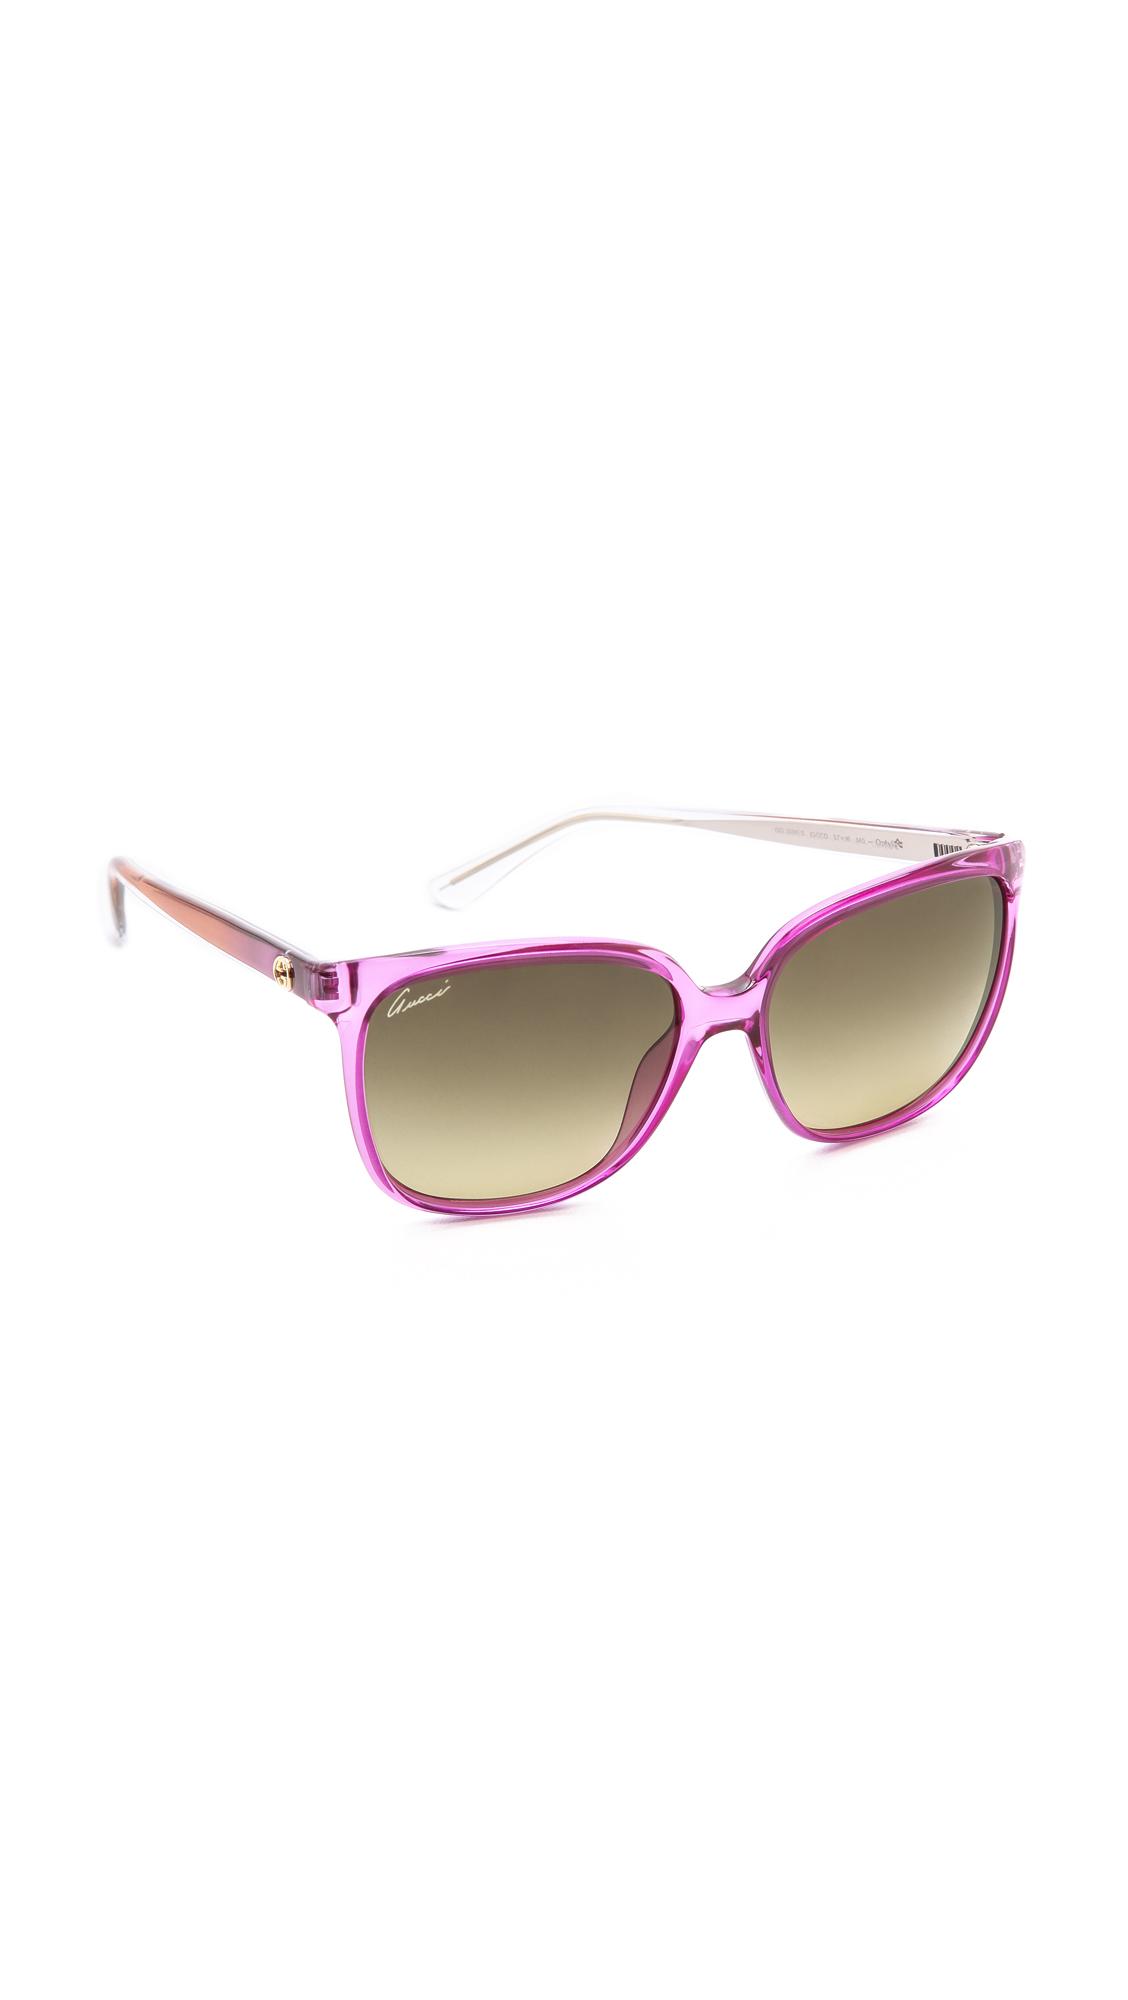 Lyst Gucci Square Gradient Sunglasses Violet Brown